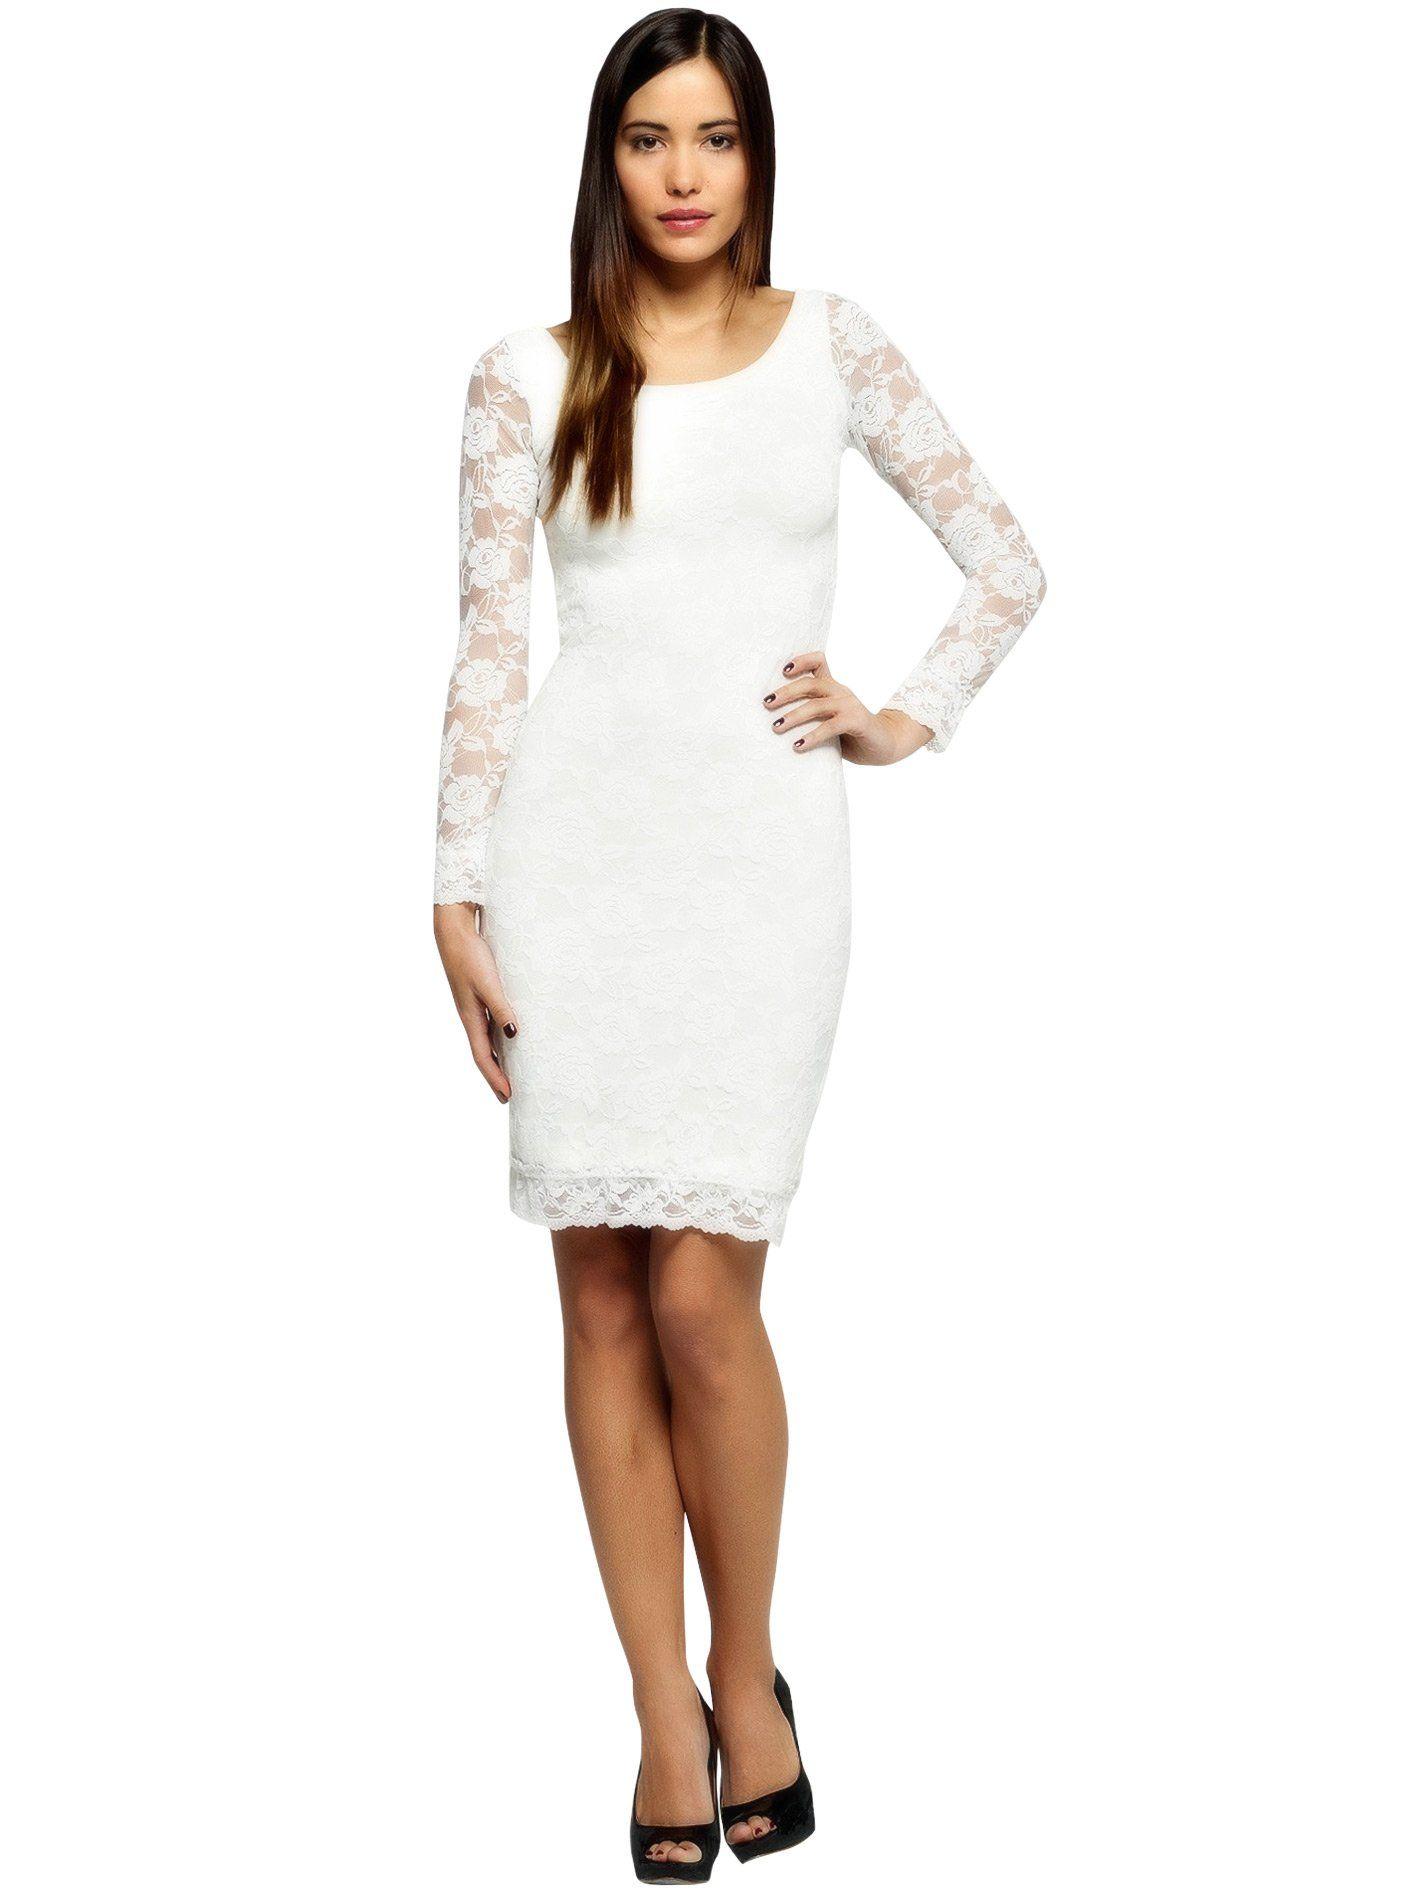 Cc usa womenus lois long sleeve sheer lace party knee length dress